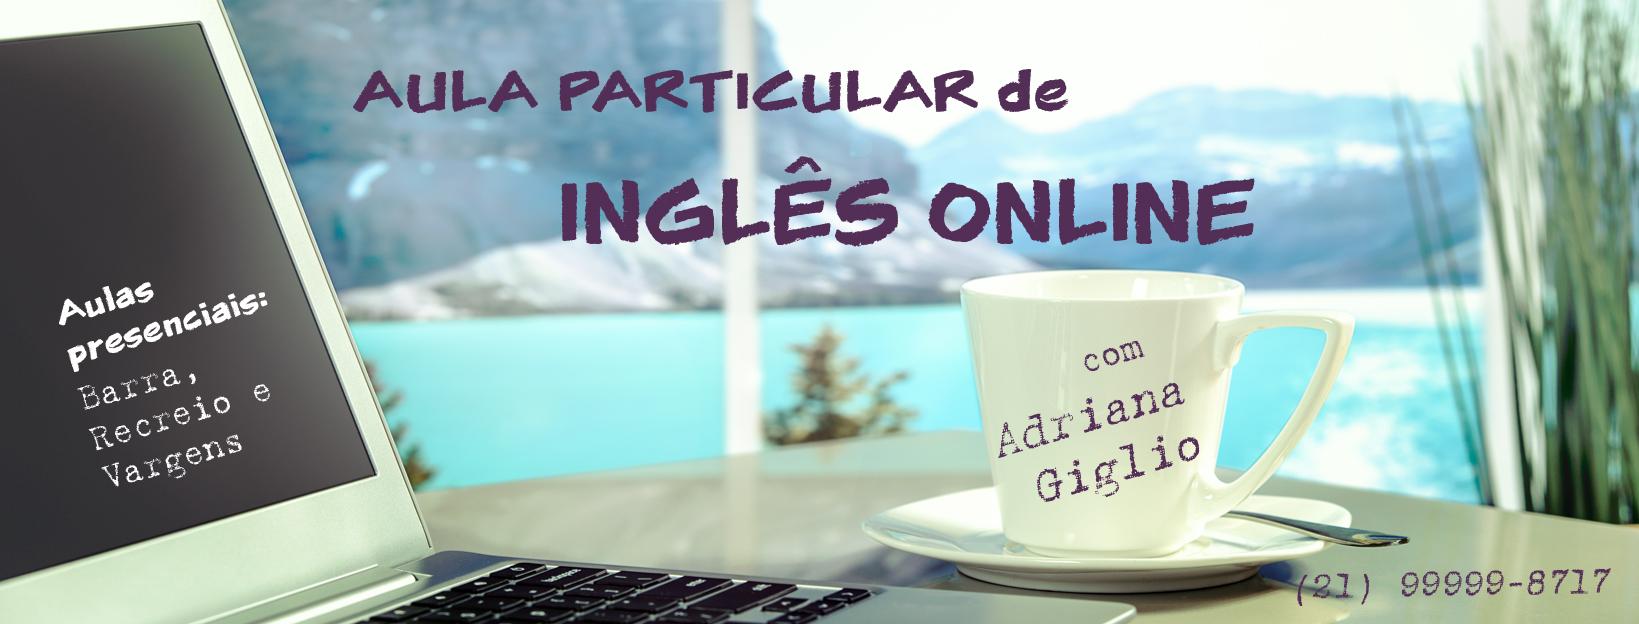 Cover_Inglês_Online_FB_2